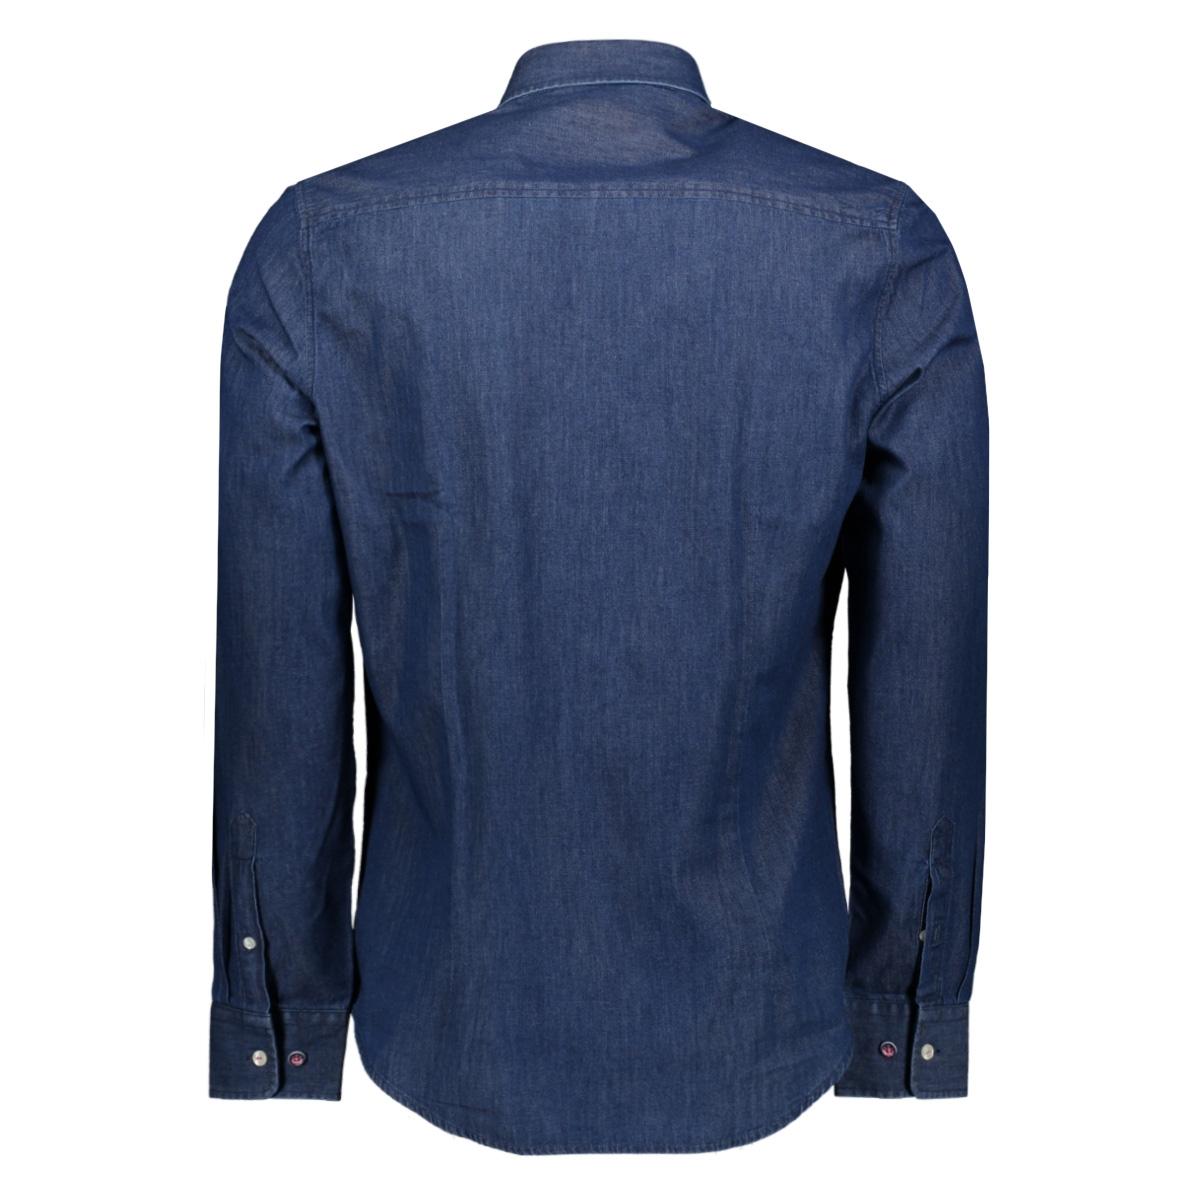 rangitahi 19an571 nza overhemd 396 indigo